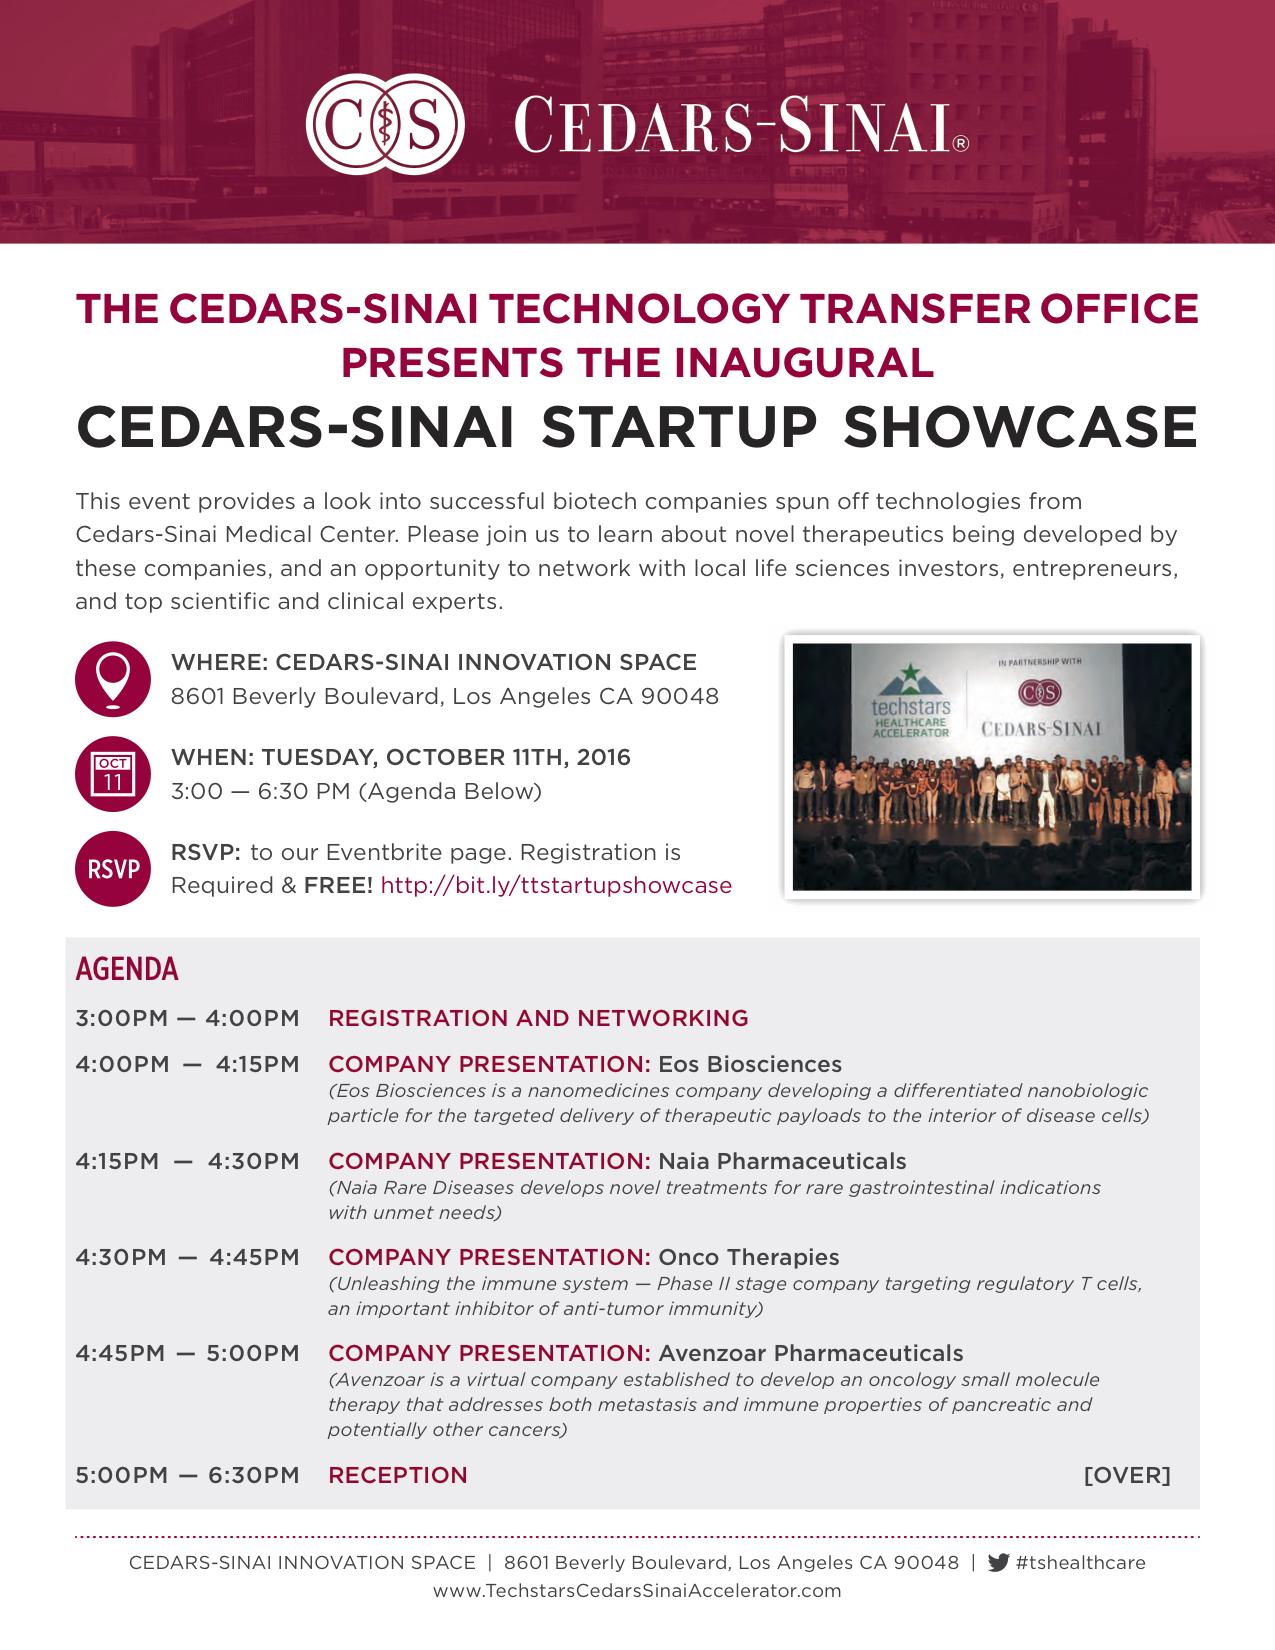 Cedars-Sinai_Startup_Showcase_-_October_11-_FINAL_Flyer_(1).jpg